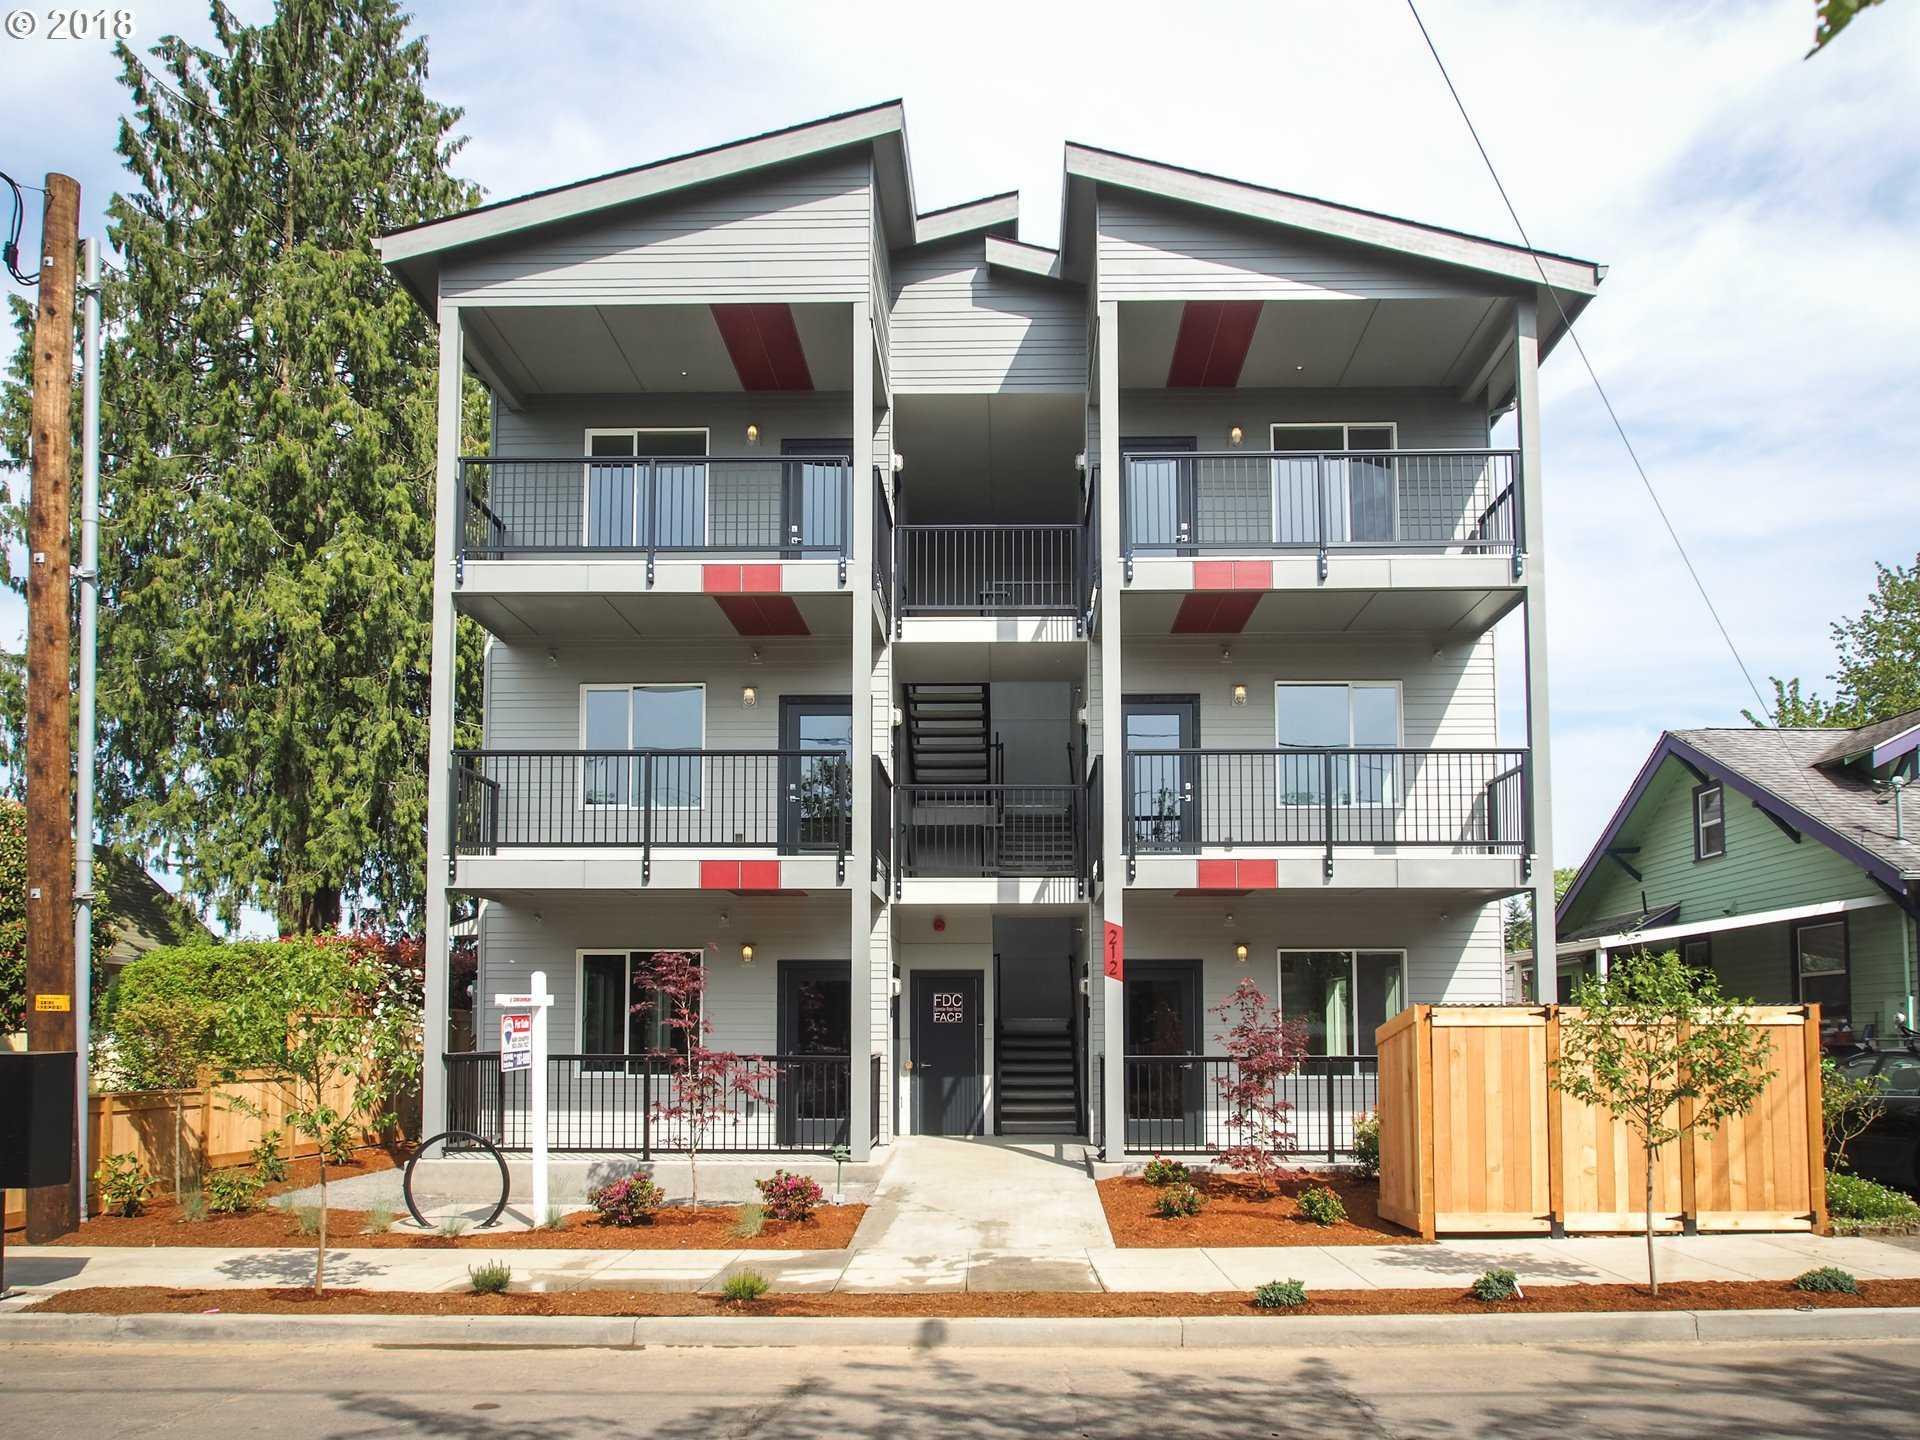 $315,500 - 2Br/1Ba -  for Sale in Tabor< Montavilla, Portland